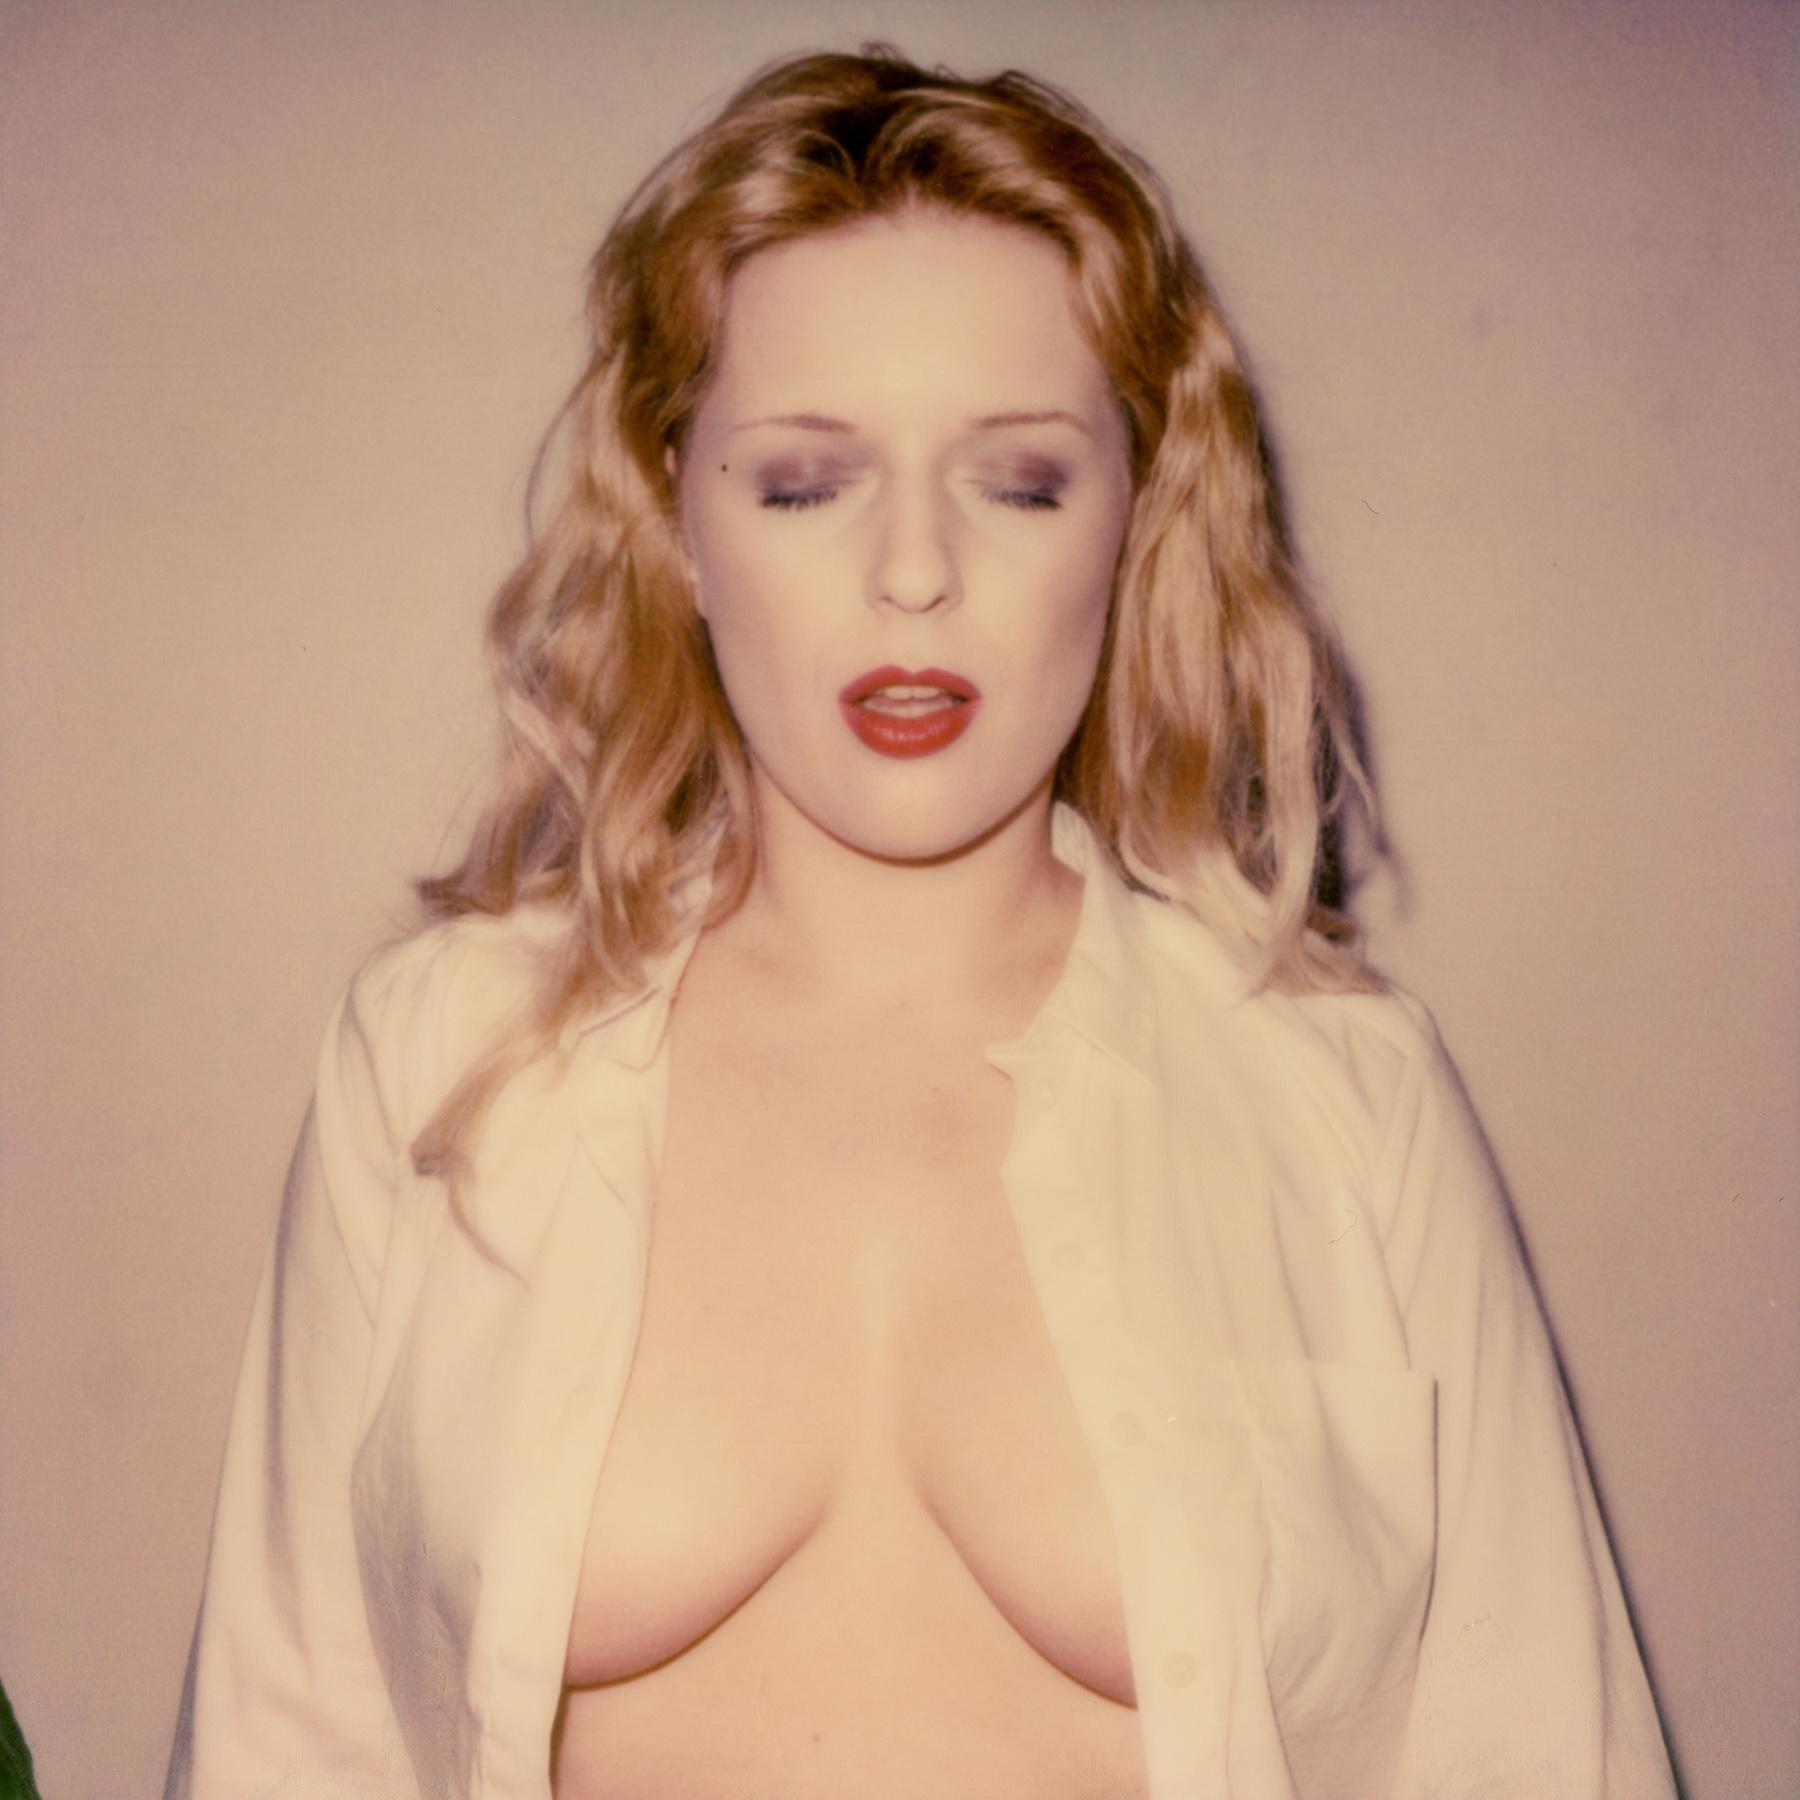 Lip Service - 21st Century, Polaroid, Potrrait, Photography, Contemporary, Color